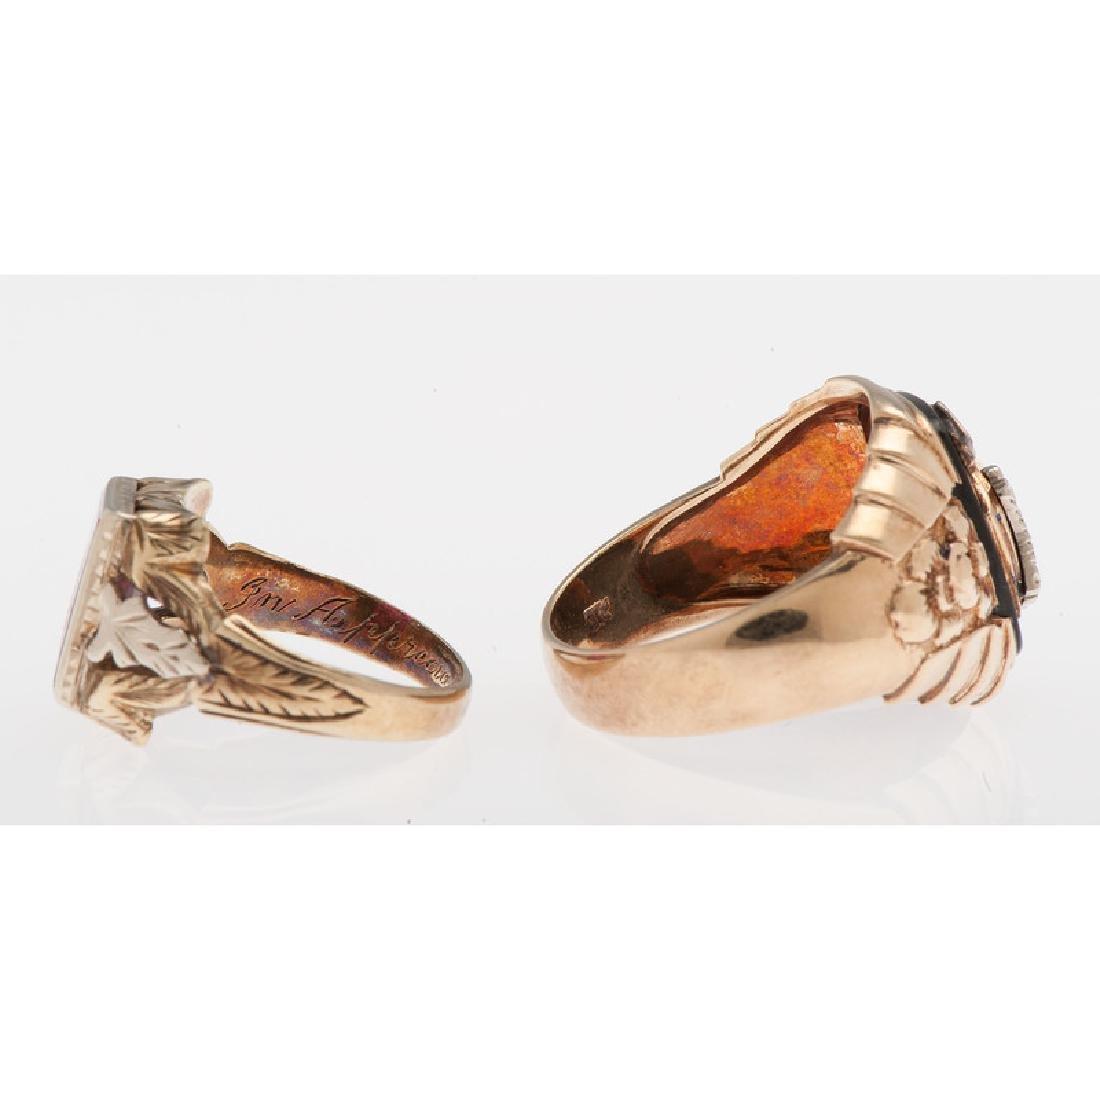 10 Karat Gold Fraternal Jewelry - 3